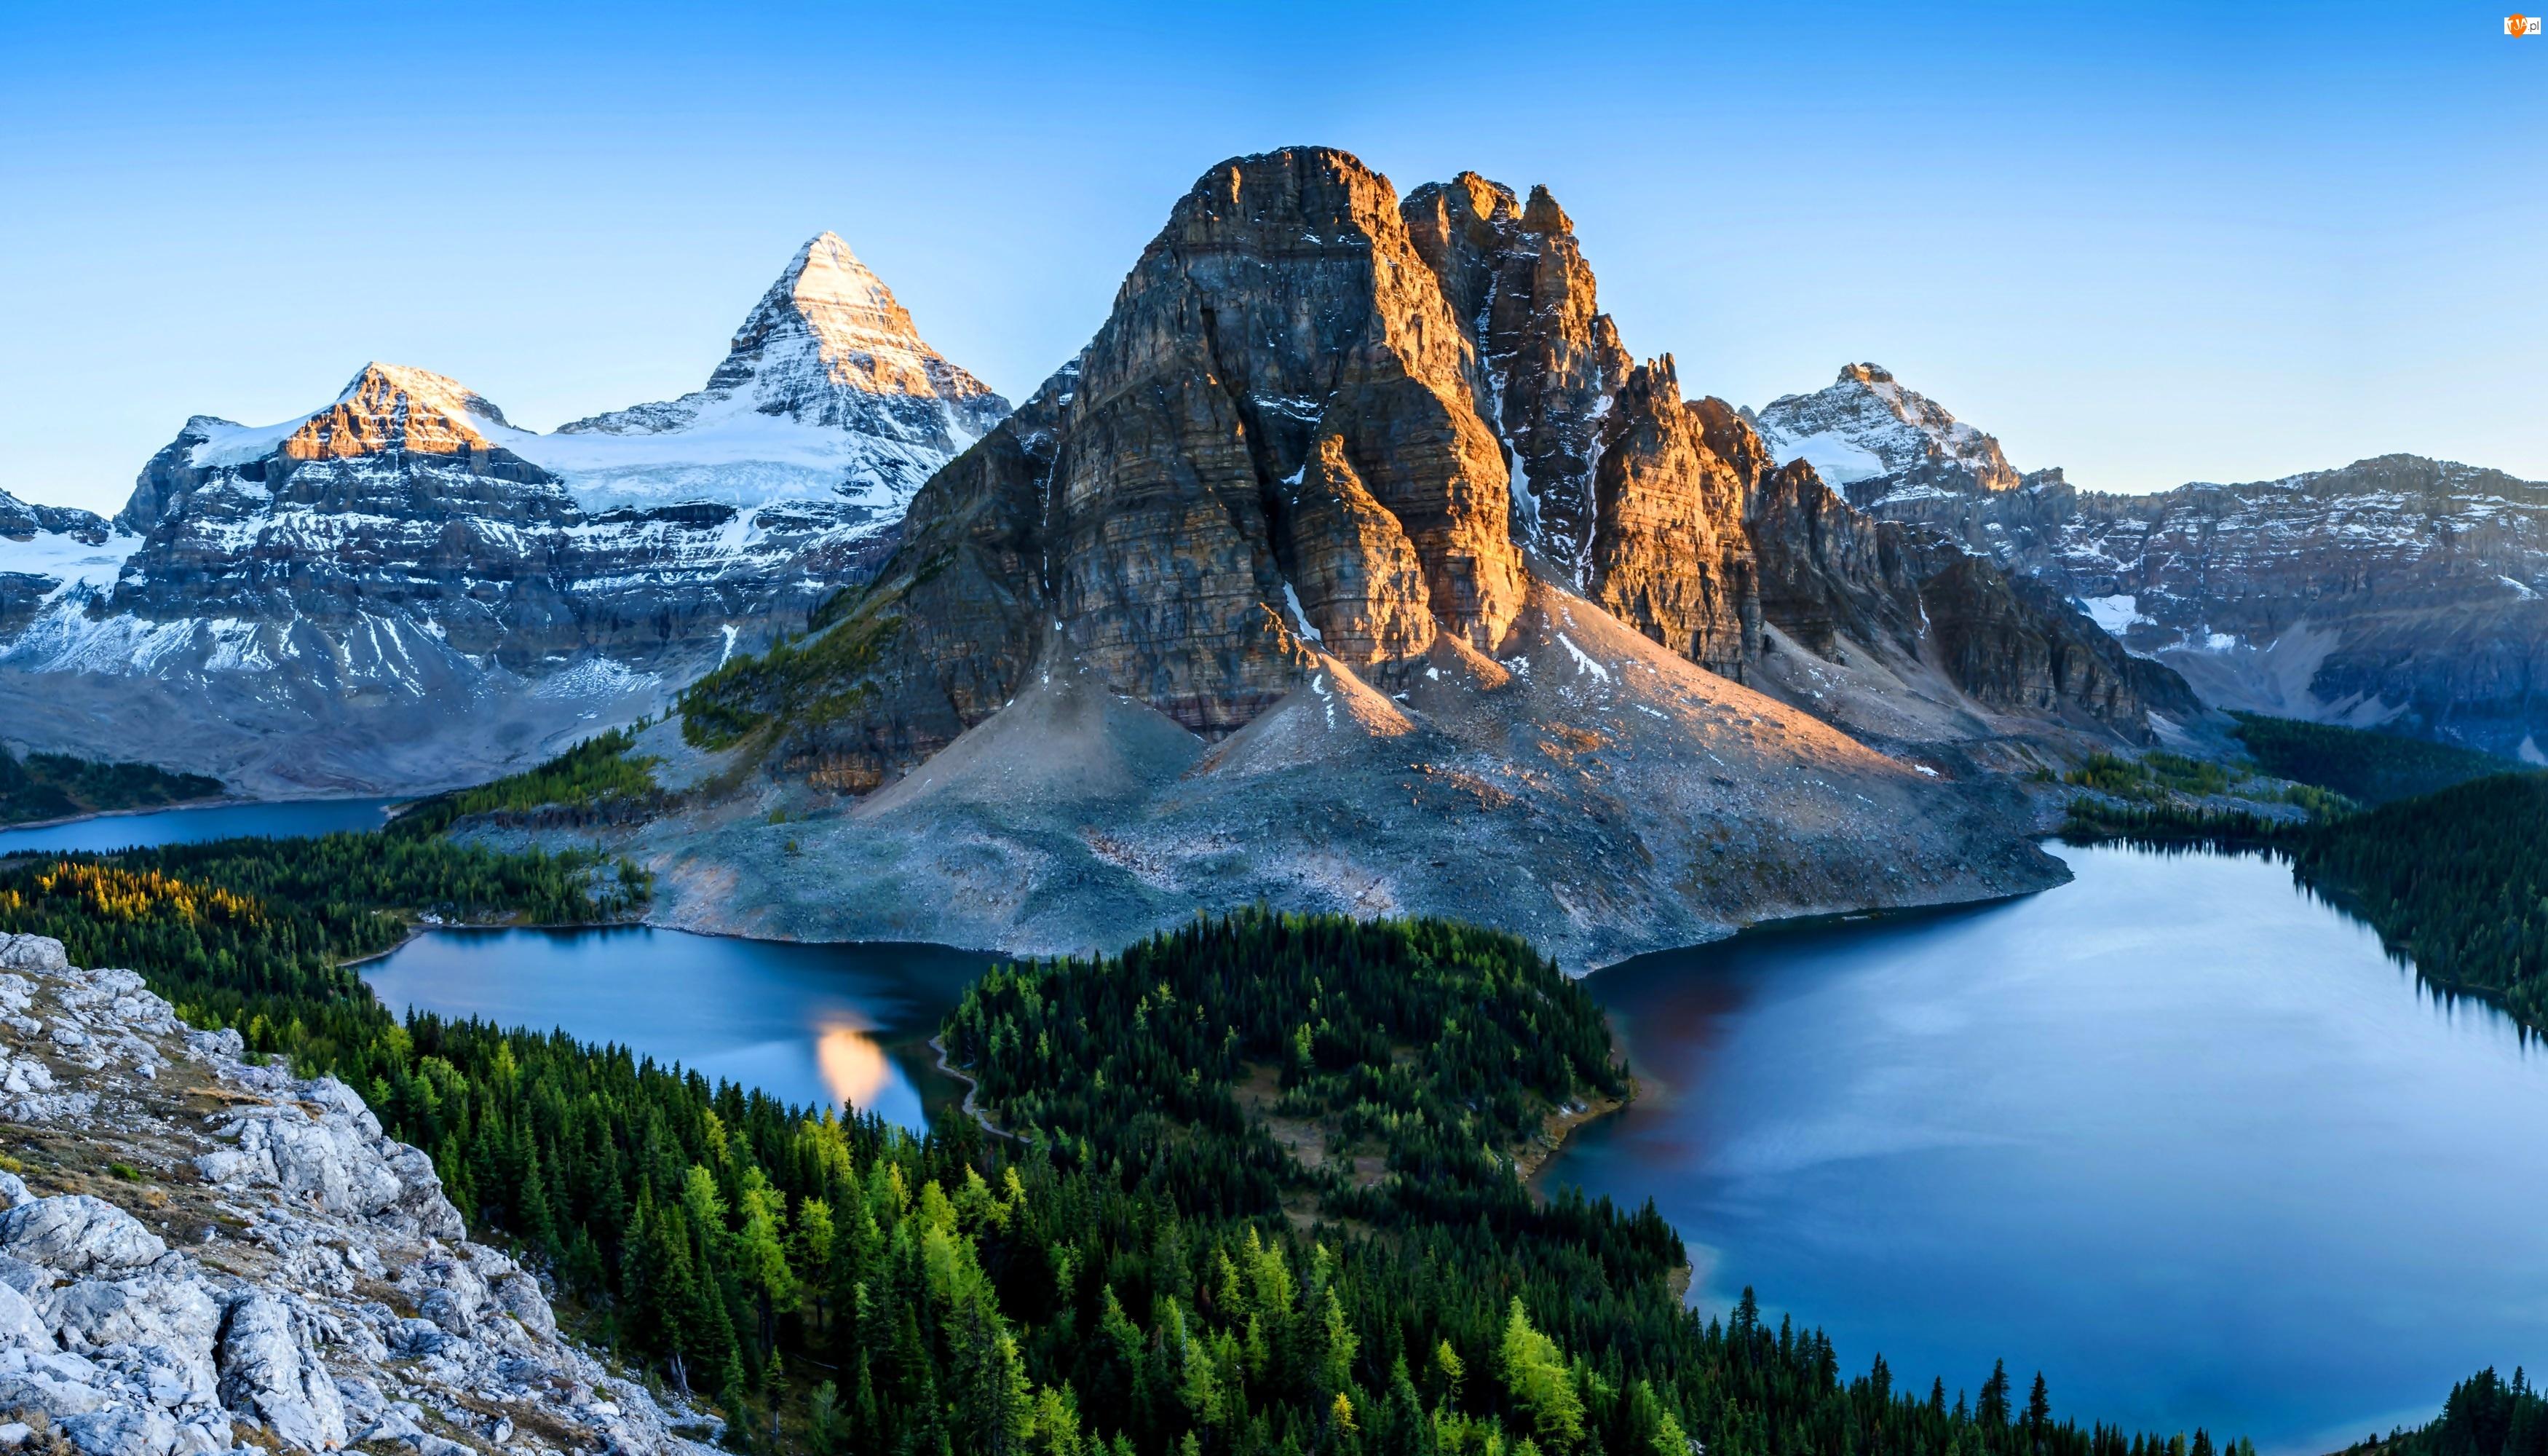 Góra Mount Assiniboine, Kanada, Prowincja Kolumbia Brytyjska, Park prowincjonalny Mount Assiniboine Provincial Park